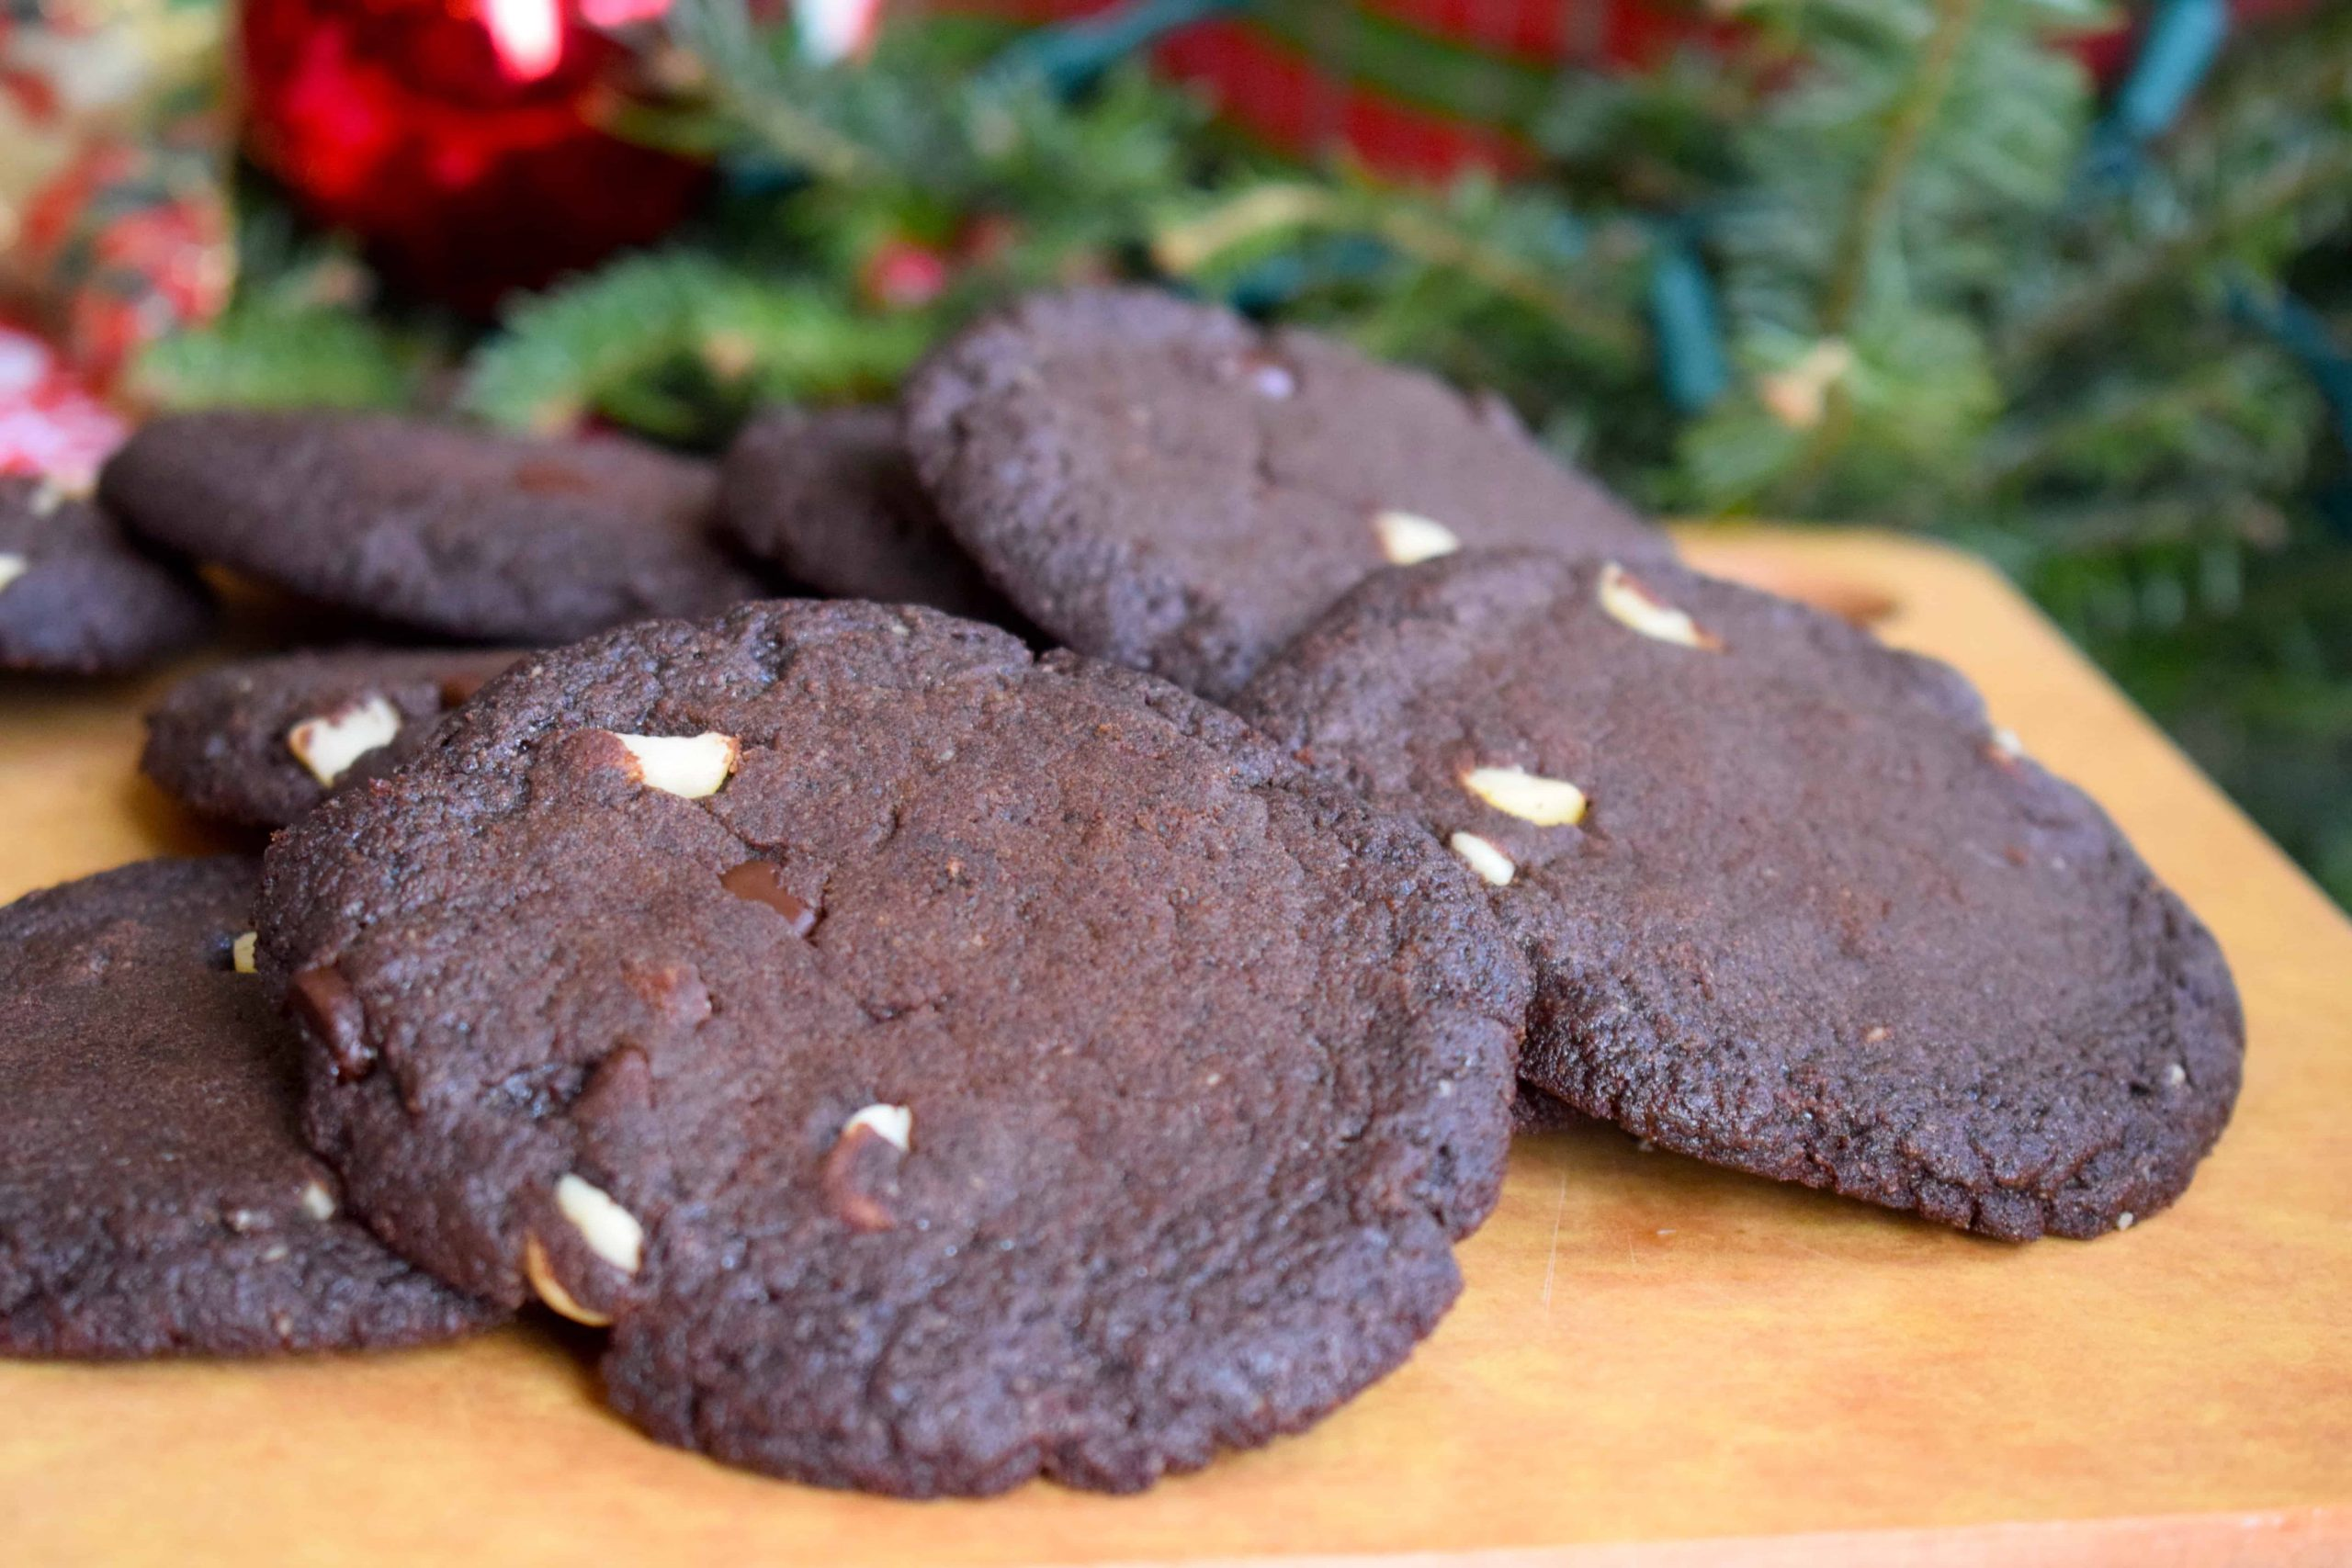 Keto Chocolate Macadamia Nut Cookies